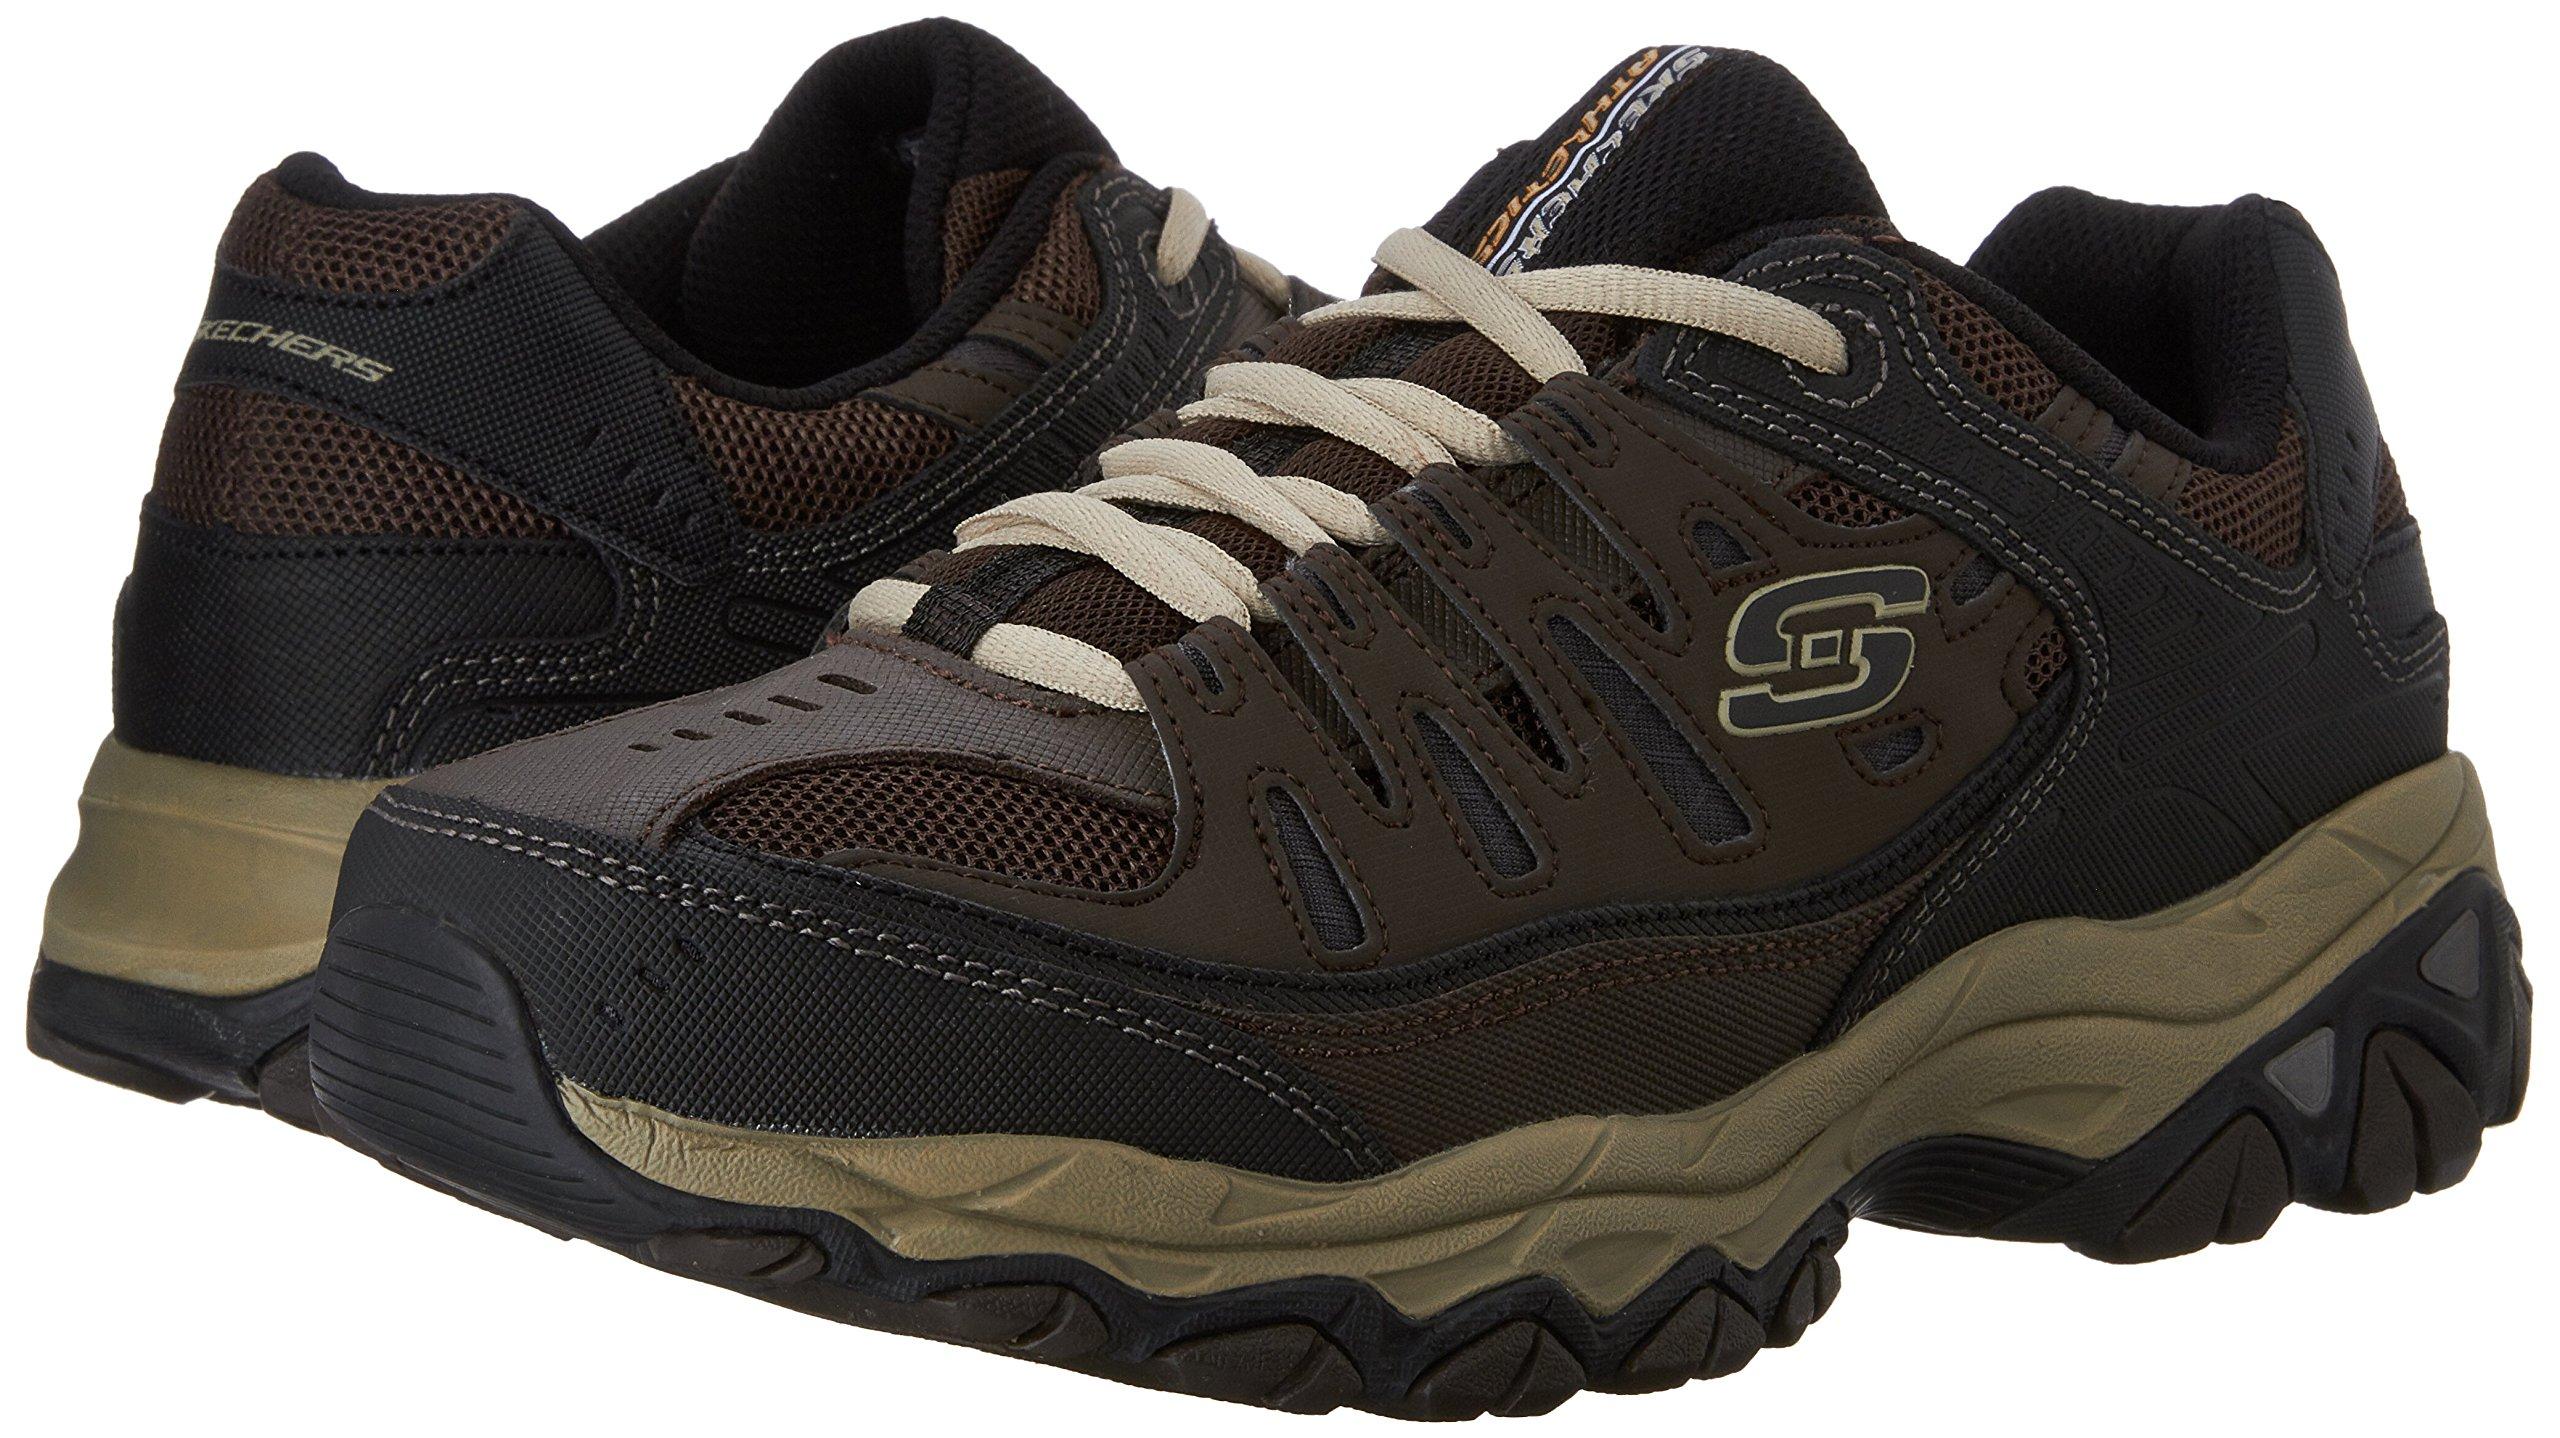 Skechers Men's AFTERBURNM.FIT Memory Foam Lace-Up Sneaker, Brown/Taupe, 7.5 M US by Skechers (Image #6)